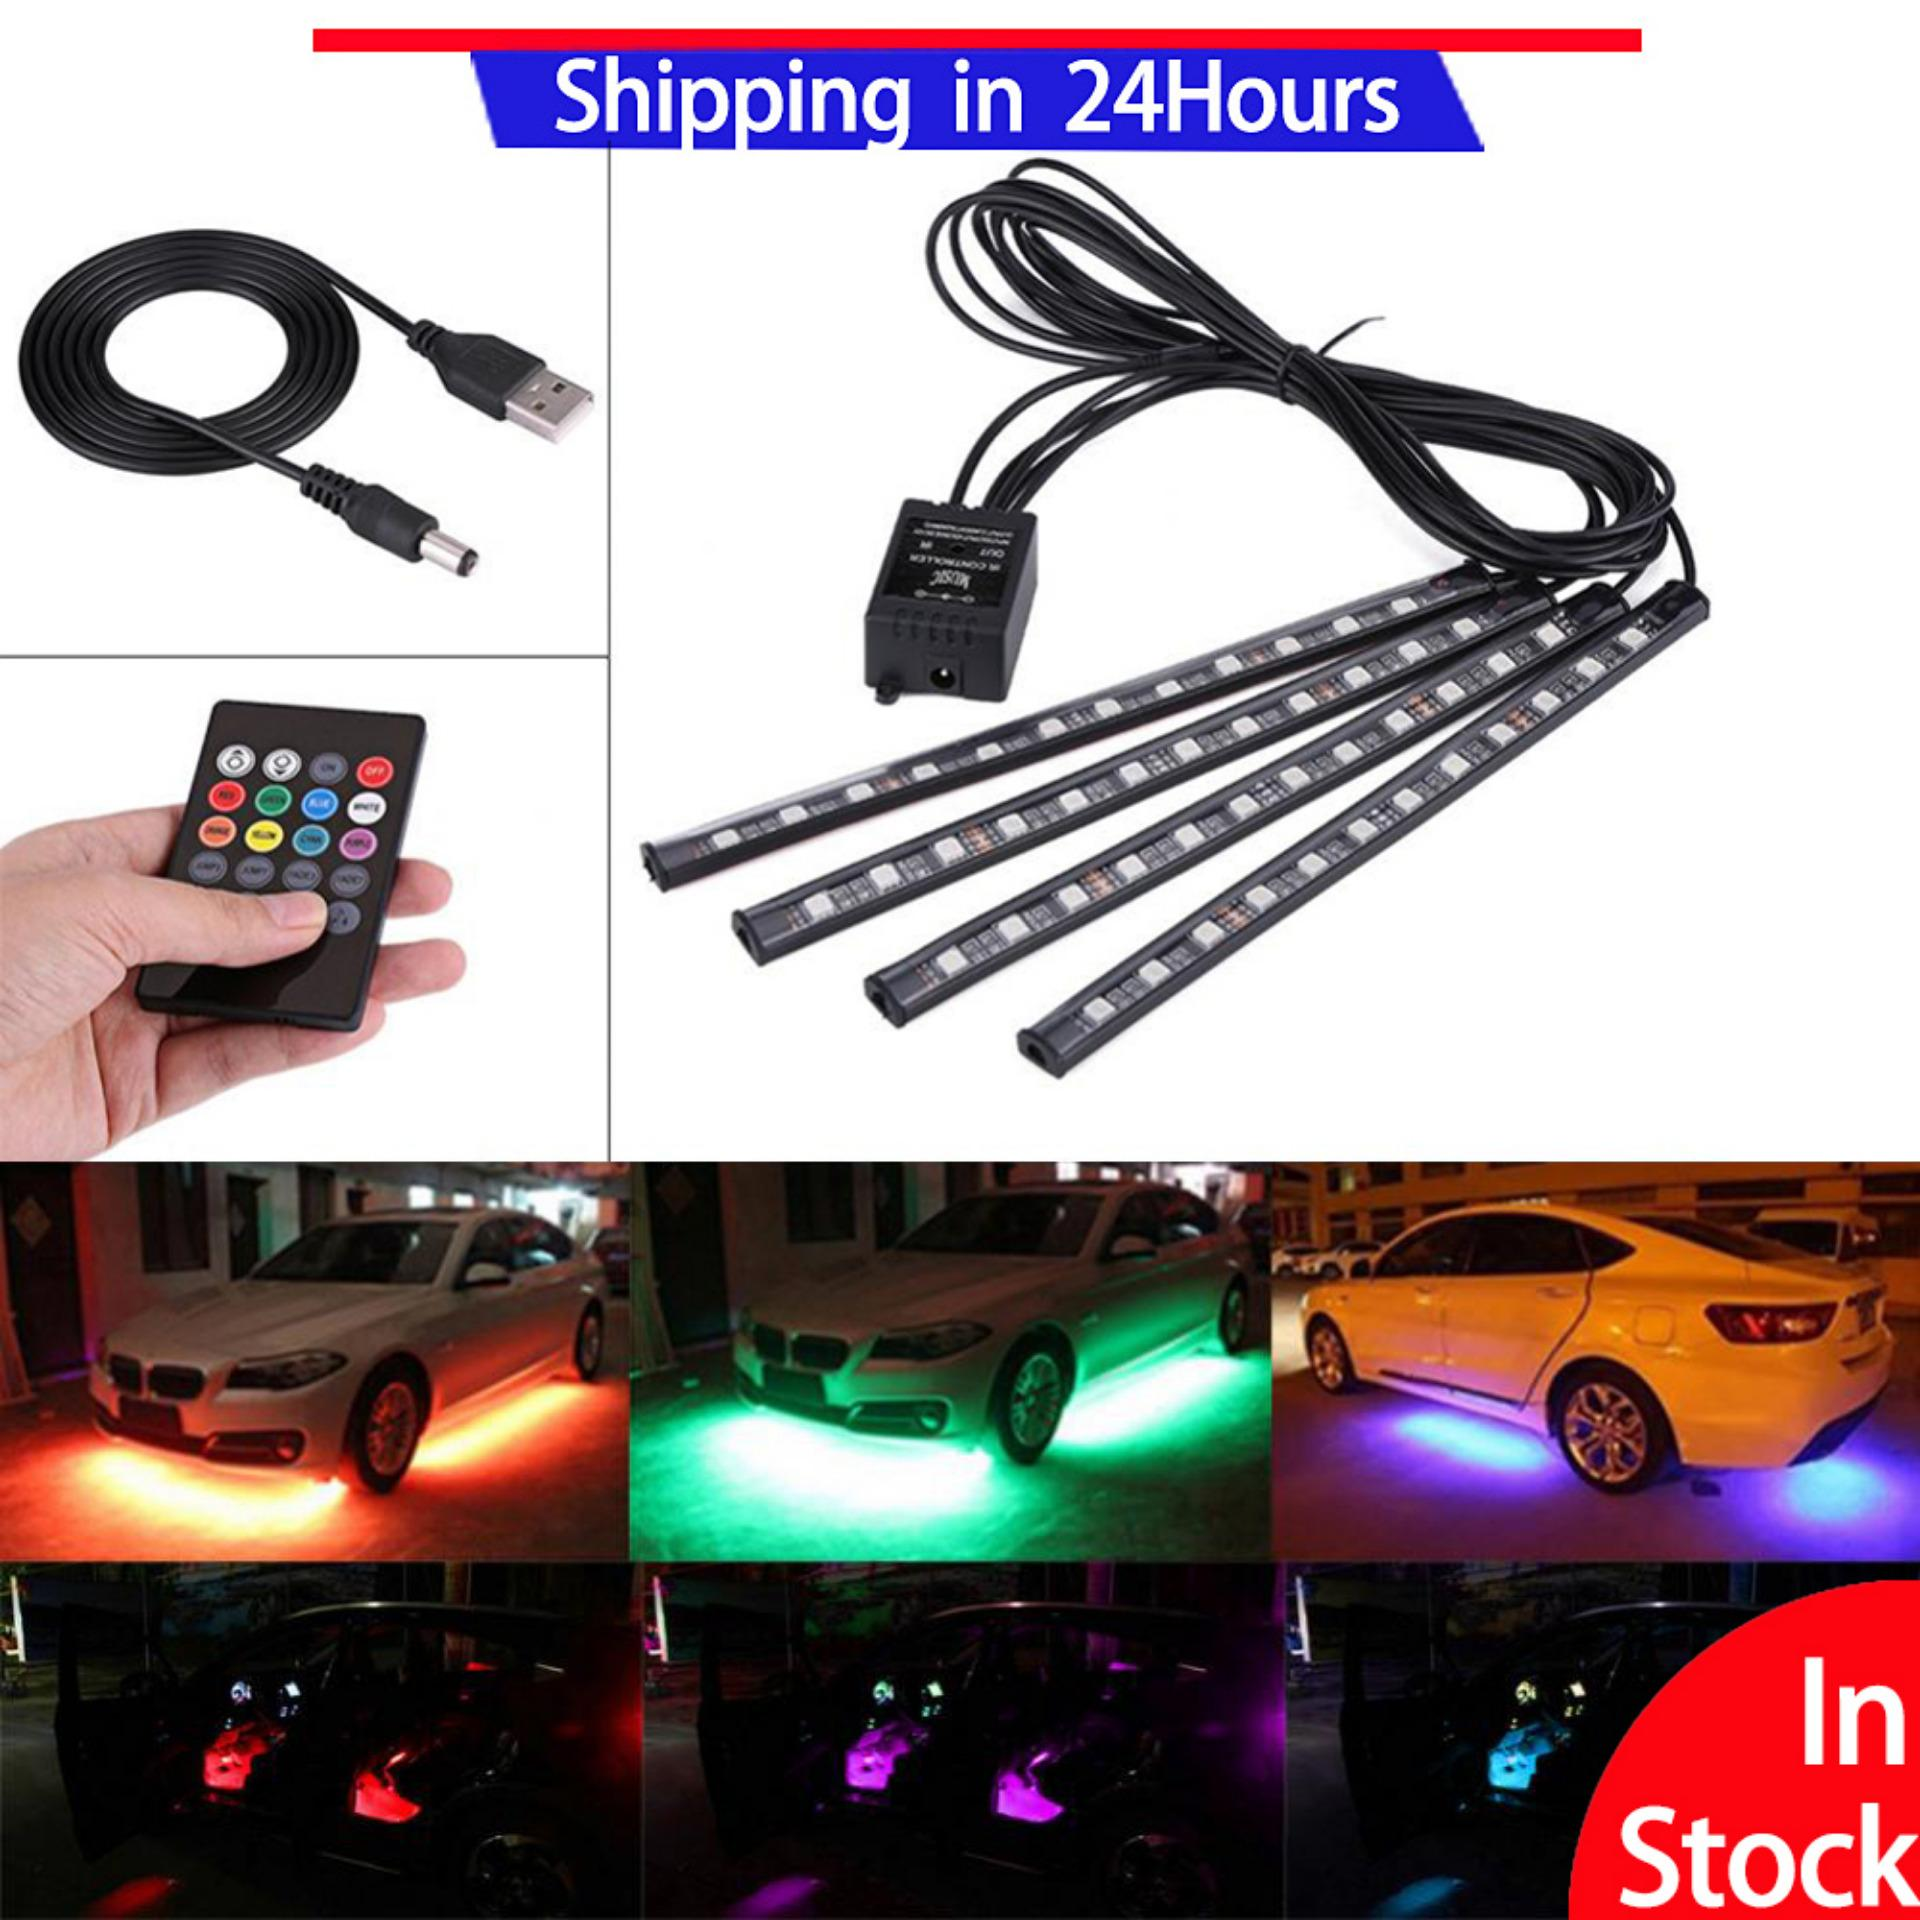 【Promotions】5V 4x 12SMD Car Interior RGB LED Strip Lights Foot Atmosphere Light Remote